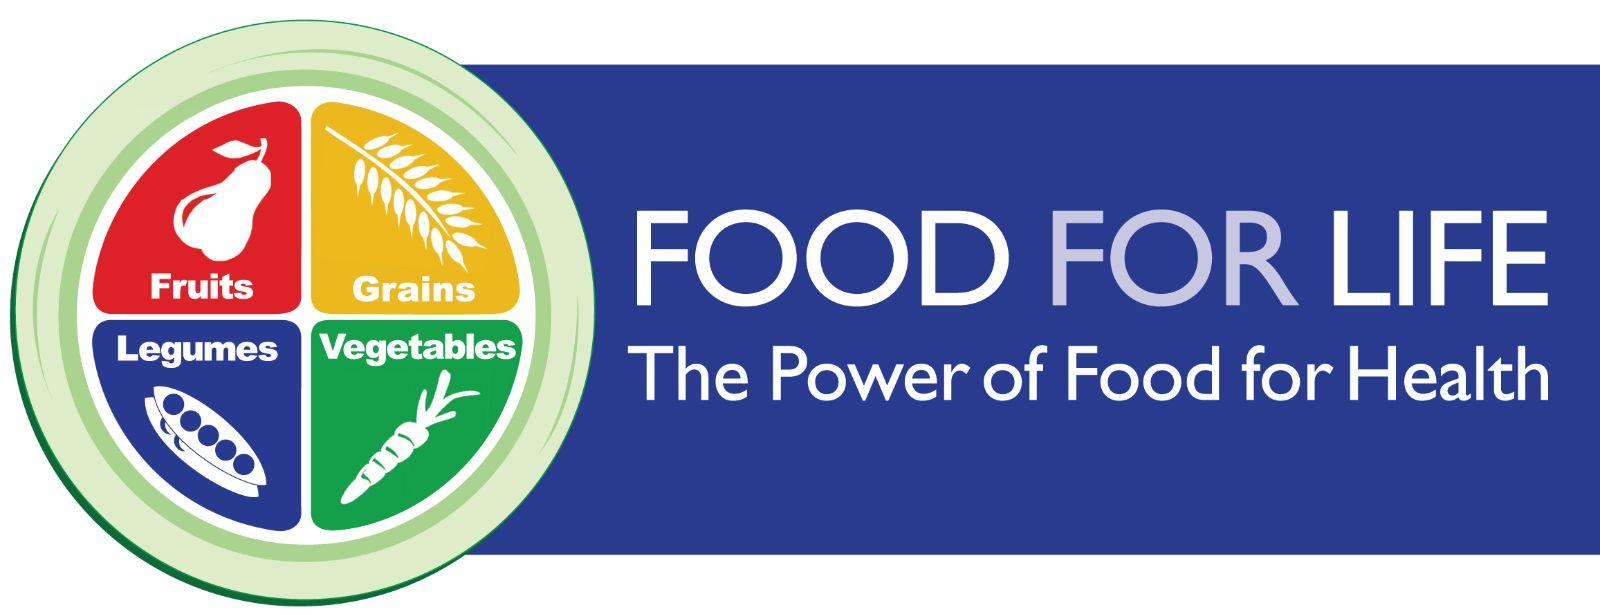 Food-for-Life-general-logo-horiziontal.jpg